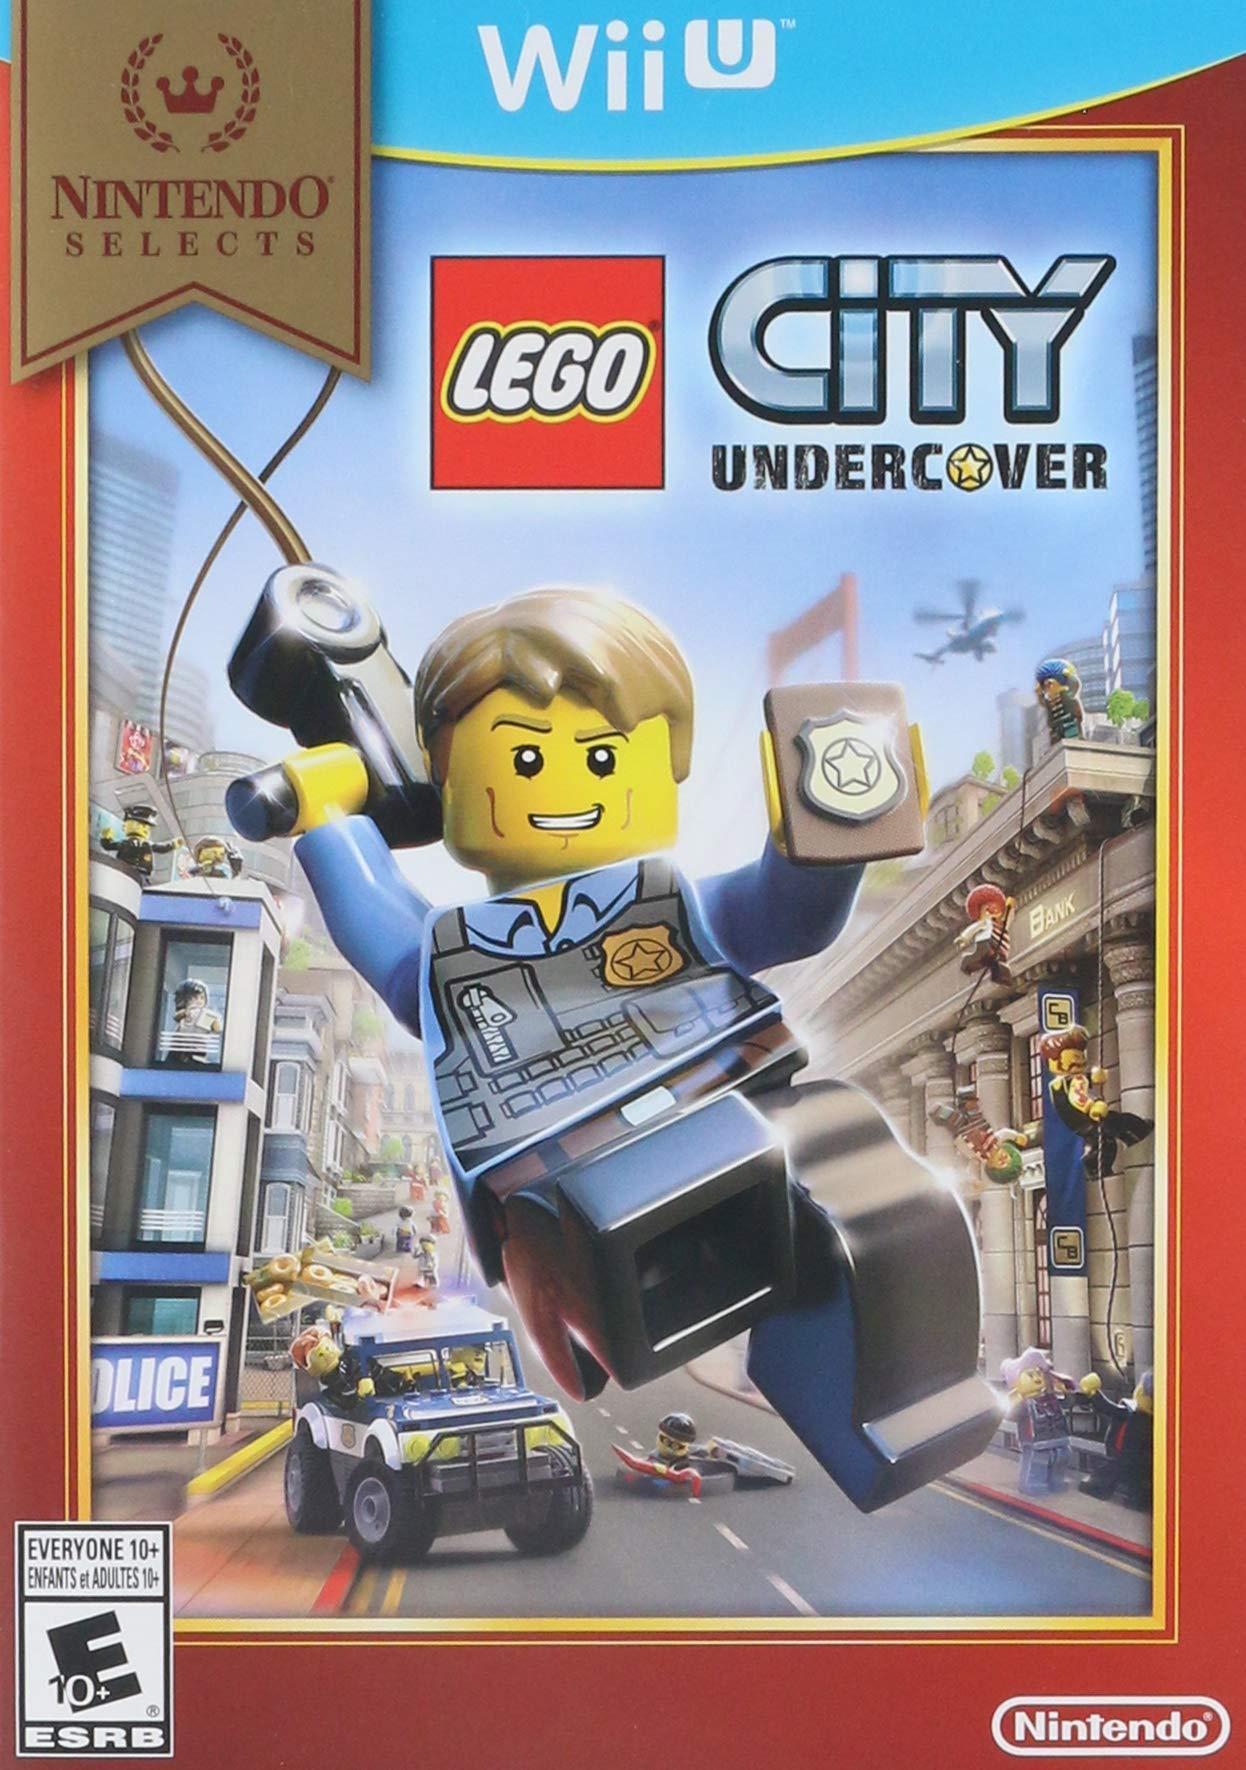 Amazon com: Nintendo Selects: Lego City: Undercover - Wii U: Video Games